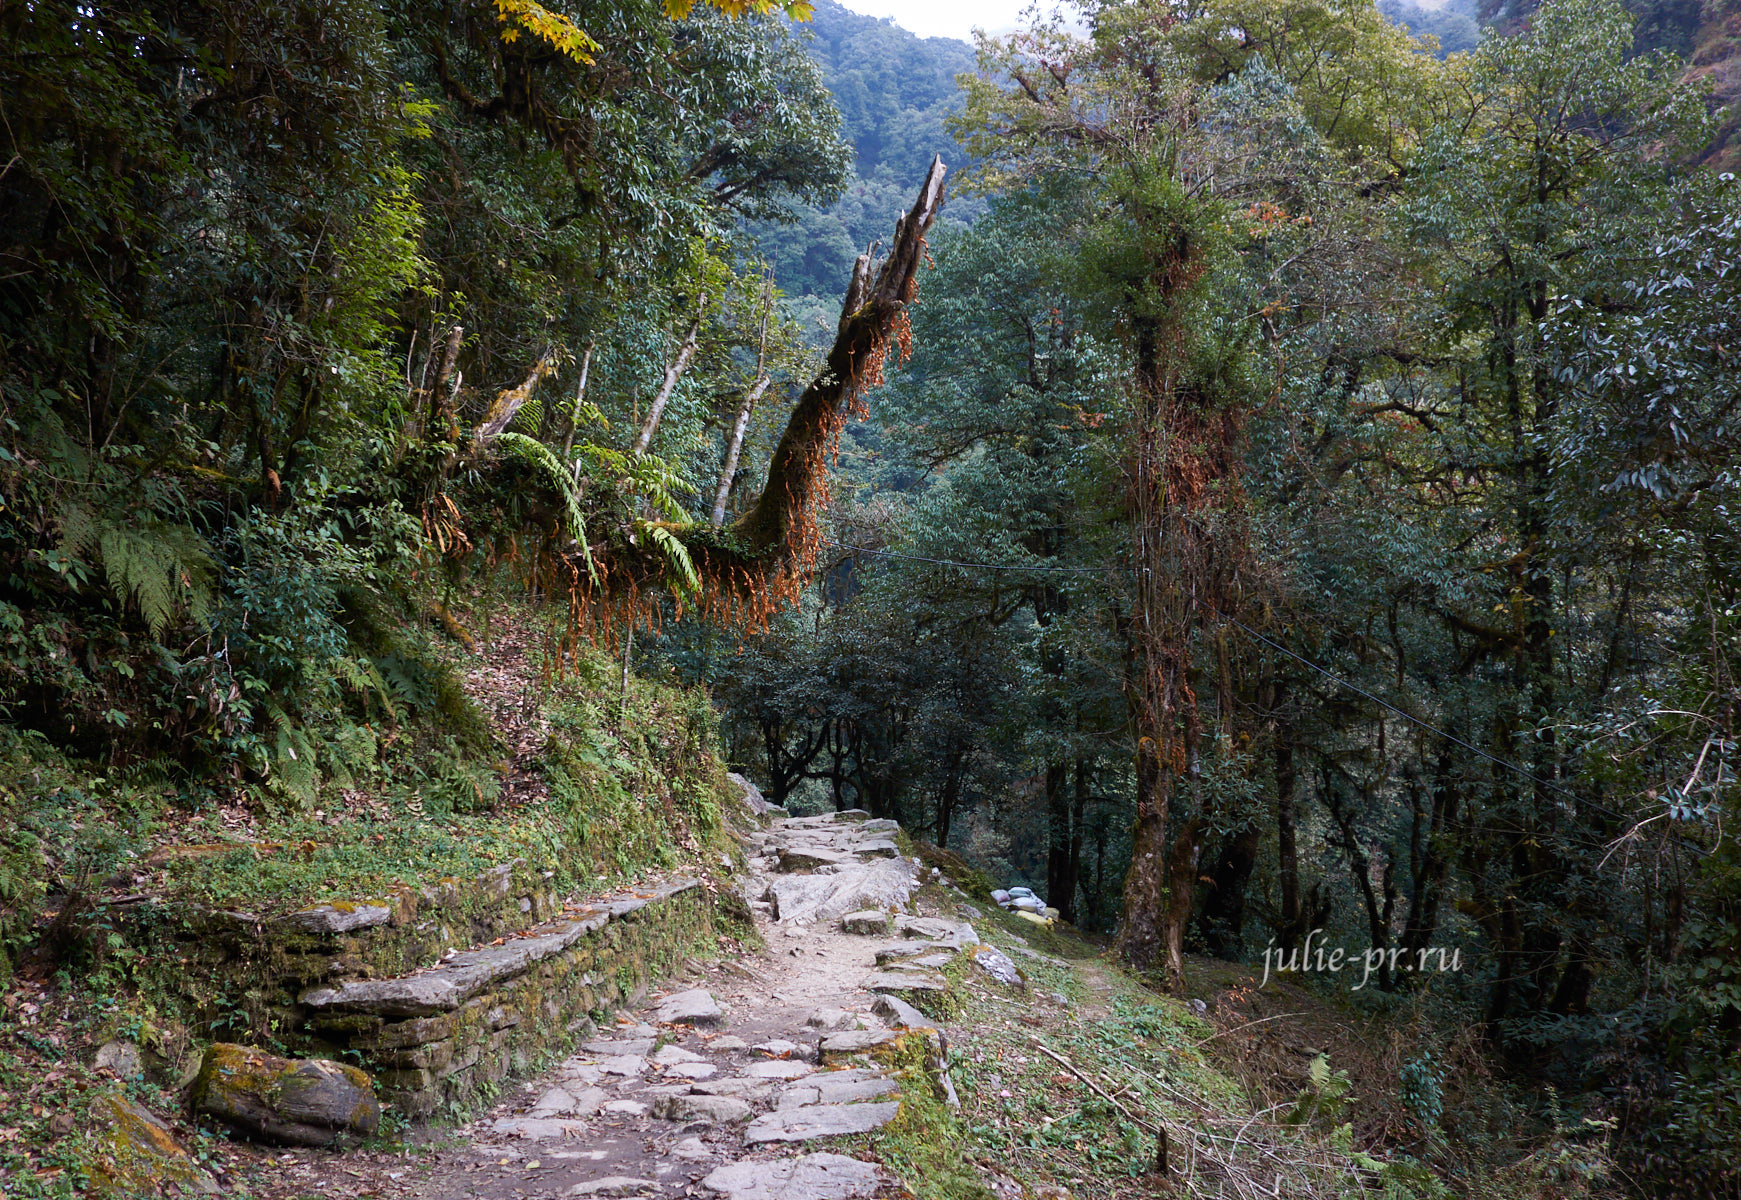 Непал, Пун-Хилл трек, Тропа в лесу